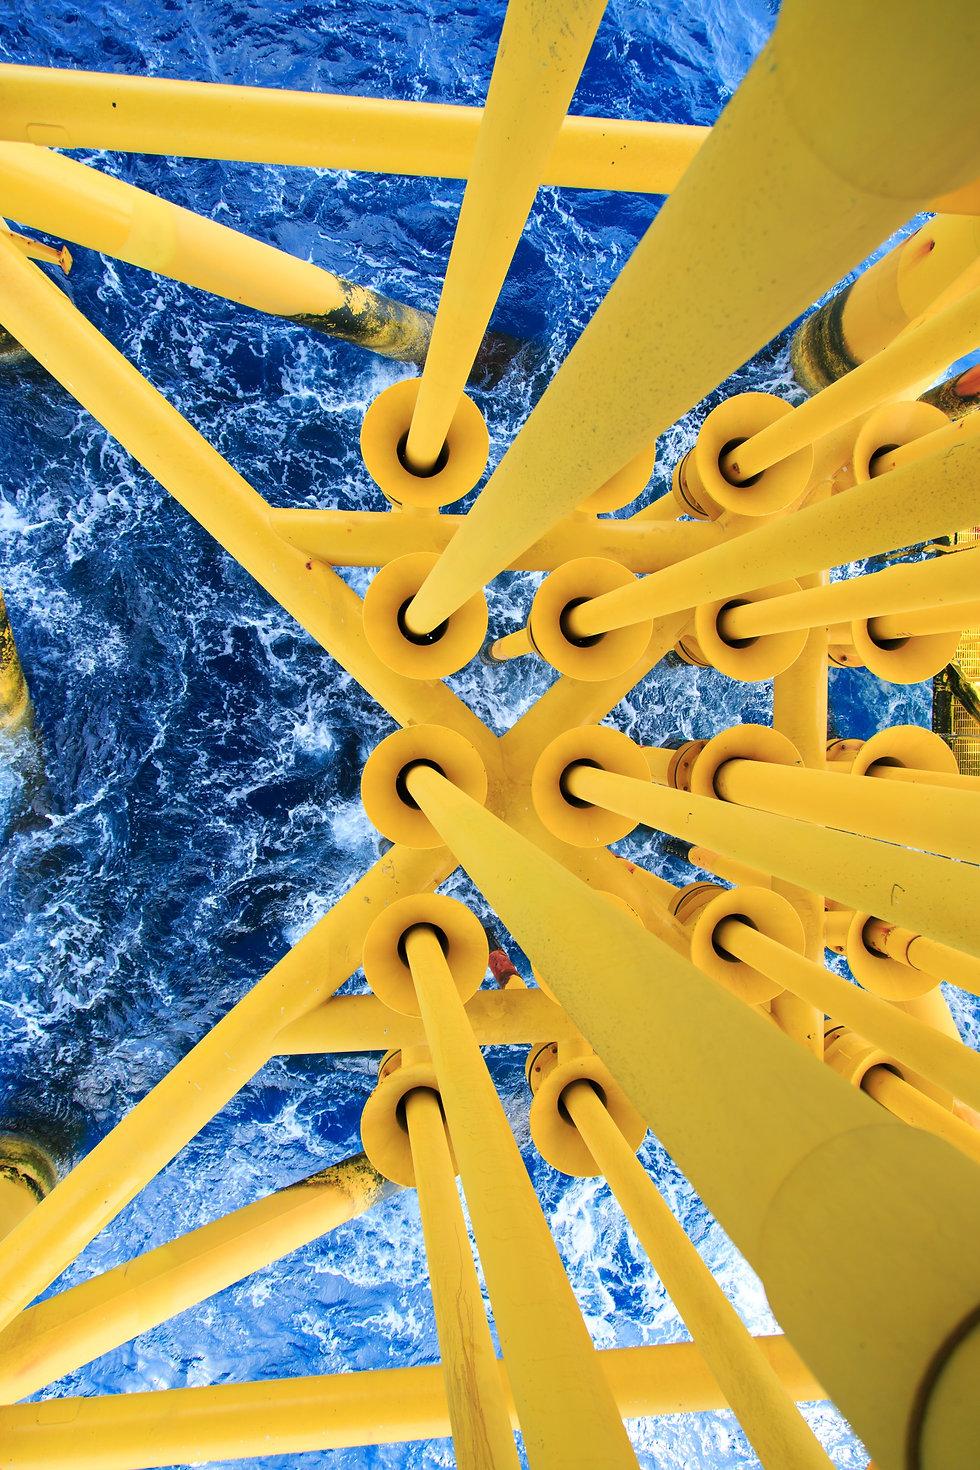 Oil%20and%20Gas%20Producing%20Slots%20at